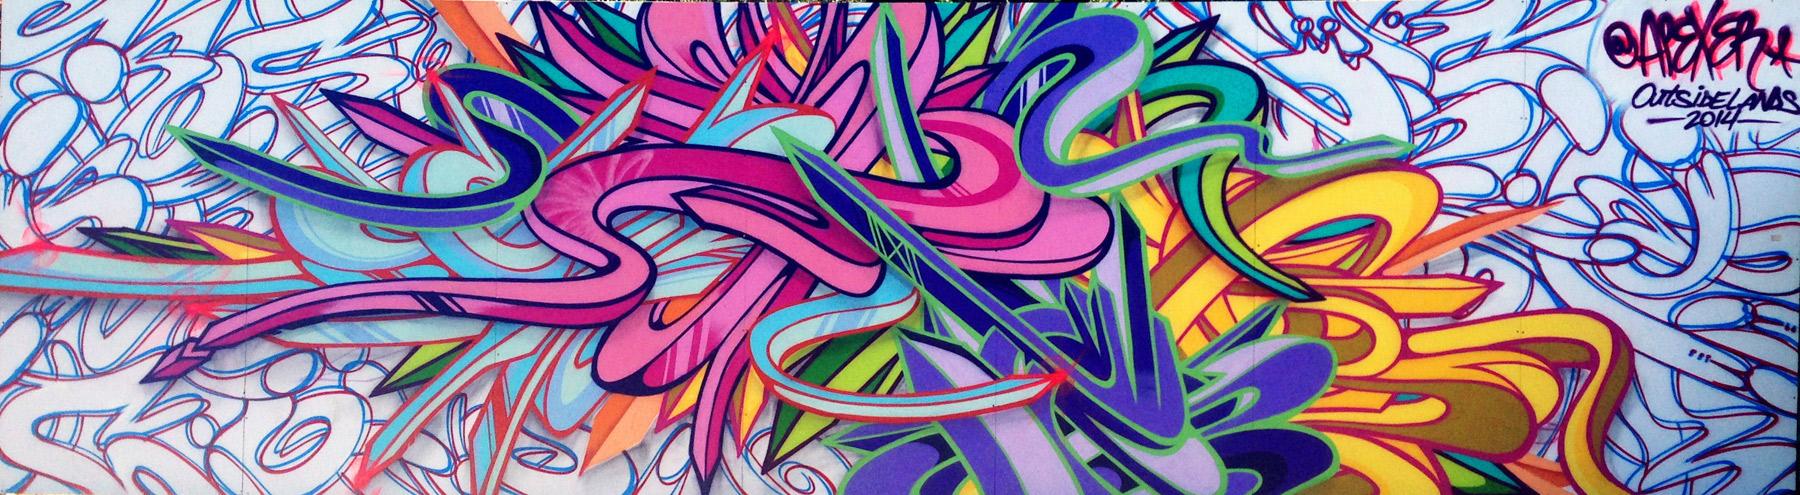 apex-one---outside2014.jpg